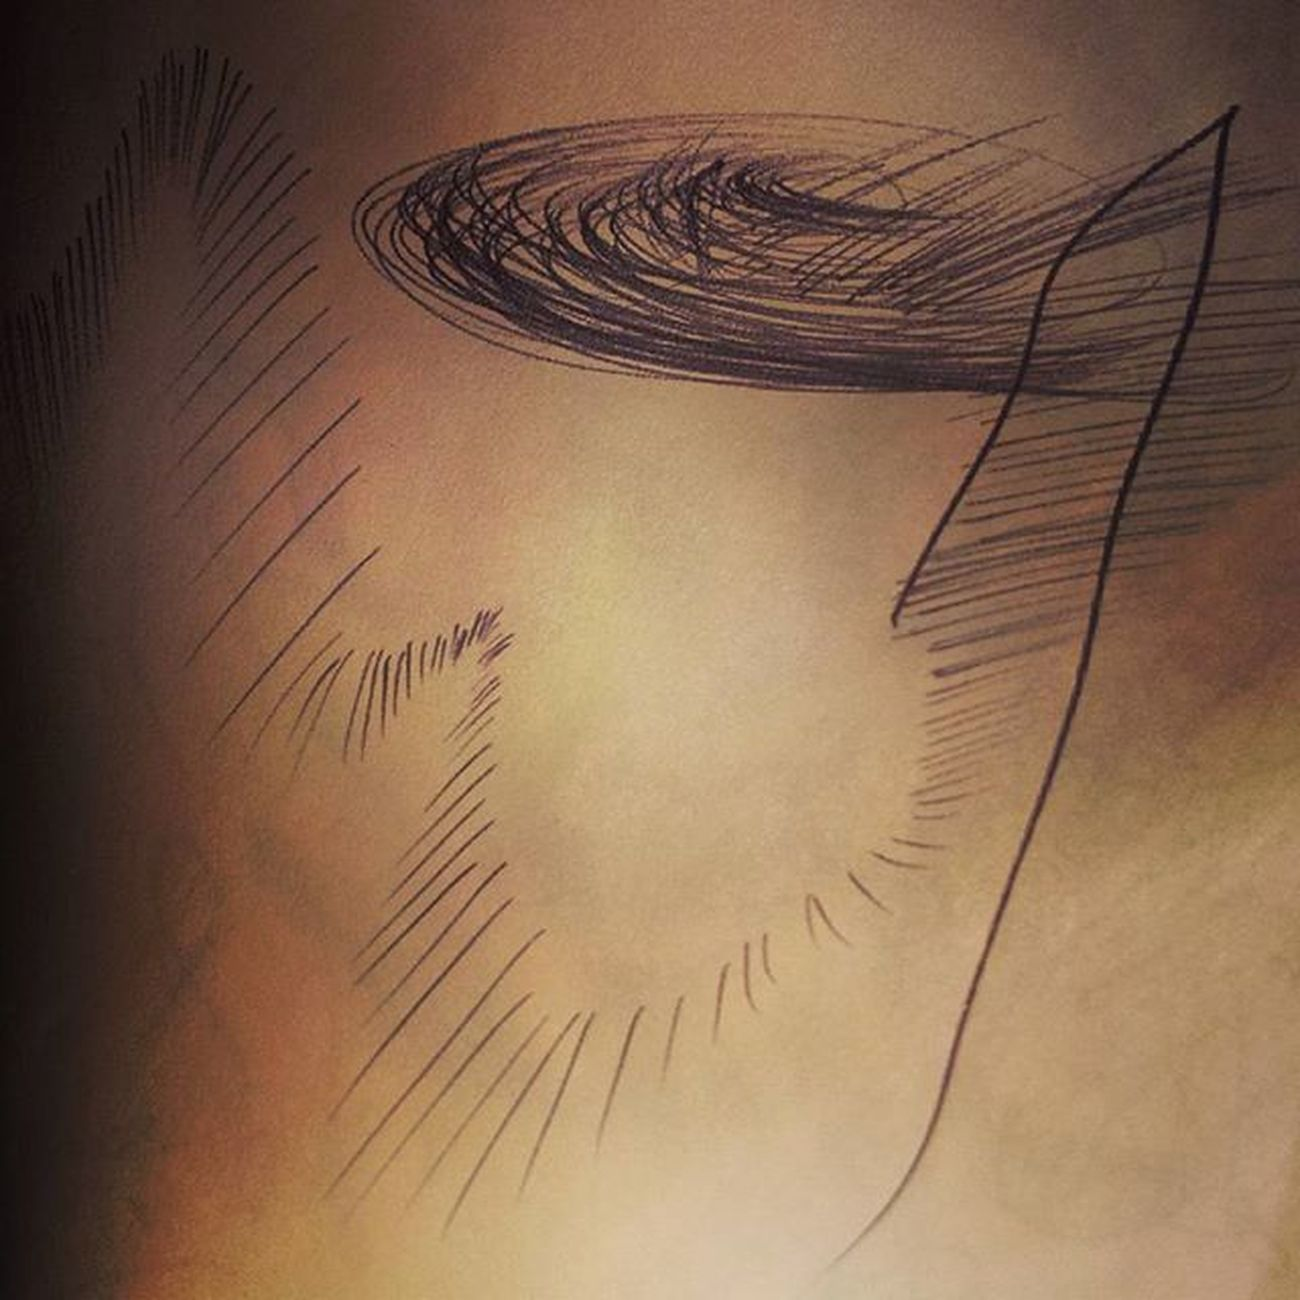 Nin Arminpaulabstract Abstractarts Artcologne Roylichtenstein Abstractexpressionism Moma Museumofmodernart Modernart Samfrancis Abstractexpressionist Artmuseum Contemporaryart Internationalart Artexhibition Drawing Basquiat Abstract Abstractart Abstractartist Abstractarts Abstracted Abstractexpressionism Abstractexpressionist Abstraction abstractorsabstractdrawing picassoartbaselwarholoasishrgiger